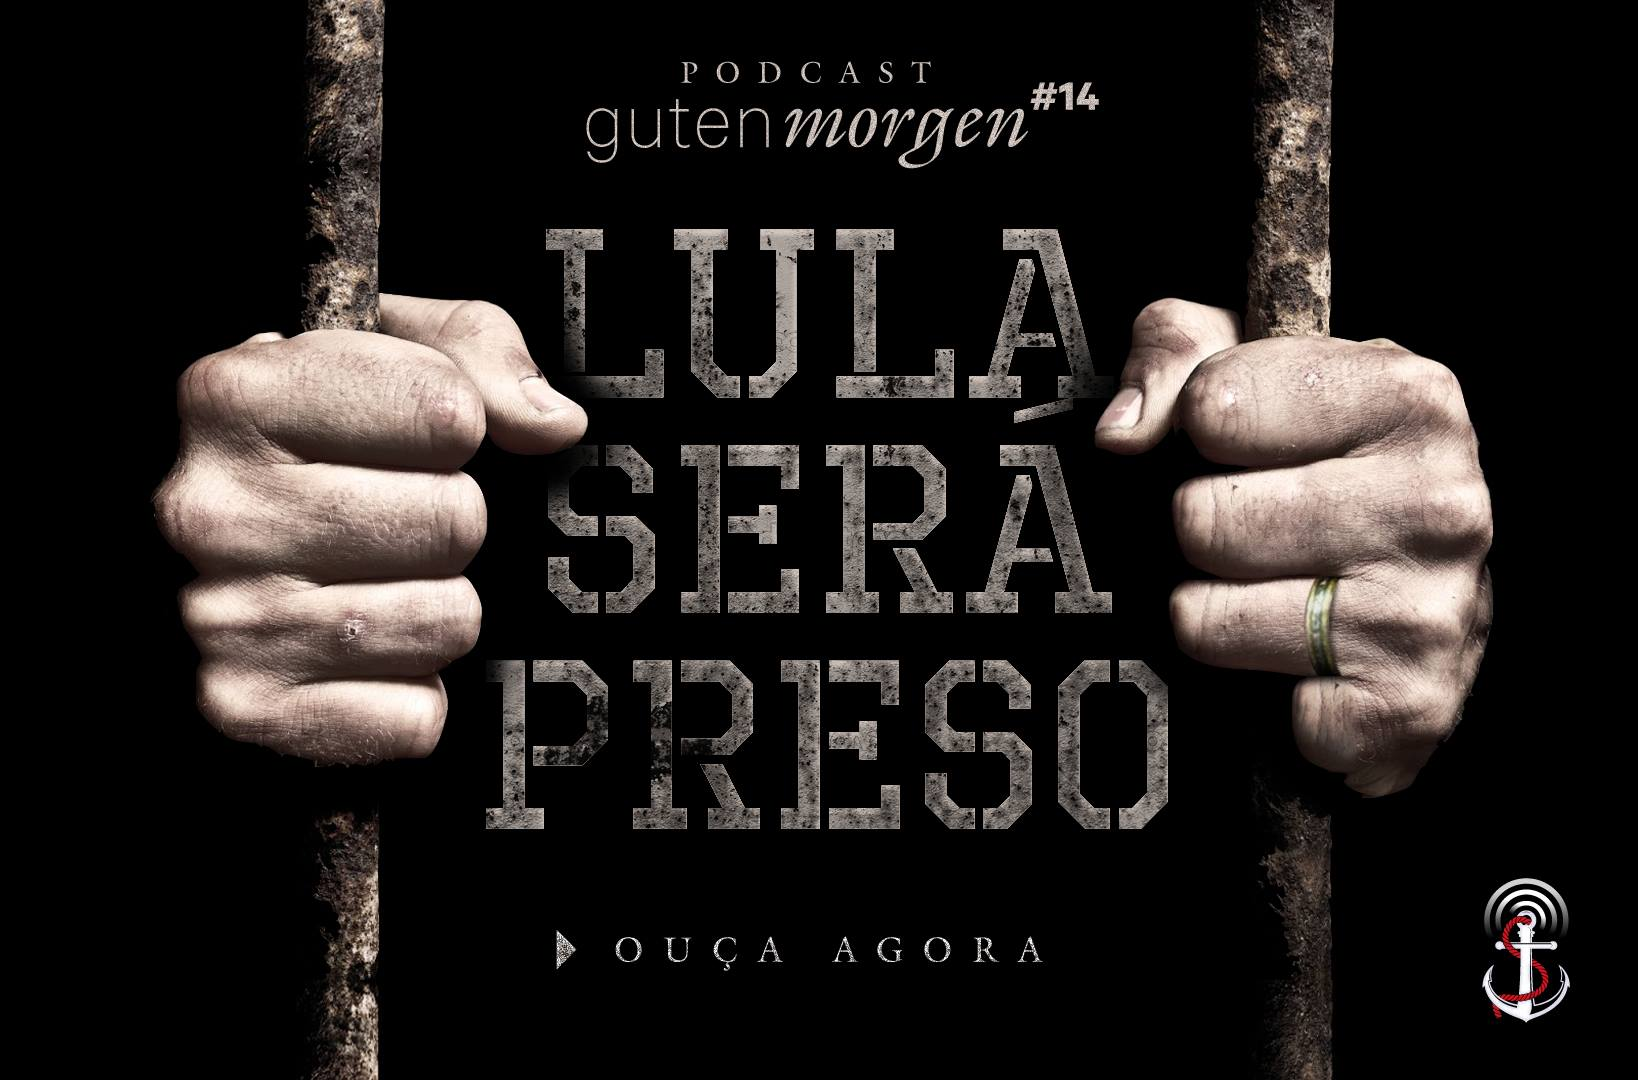 Guten Morgen 14: Lula será preso. Podcast do SensoIncomum.org